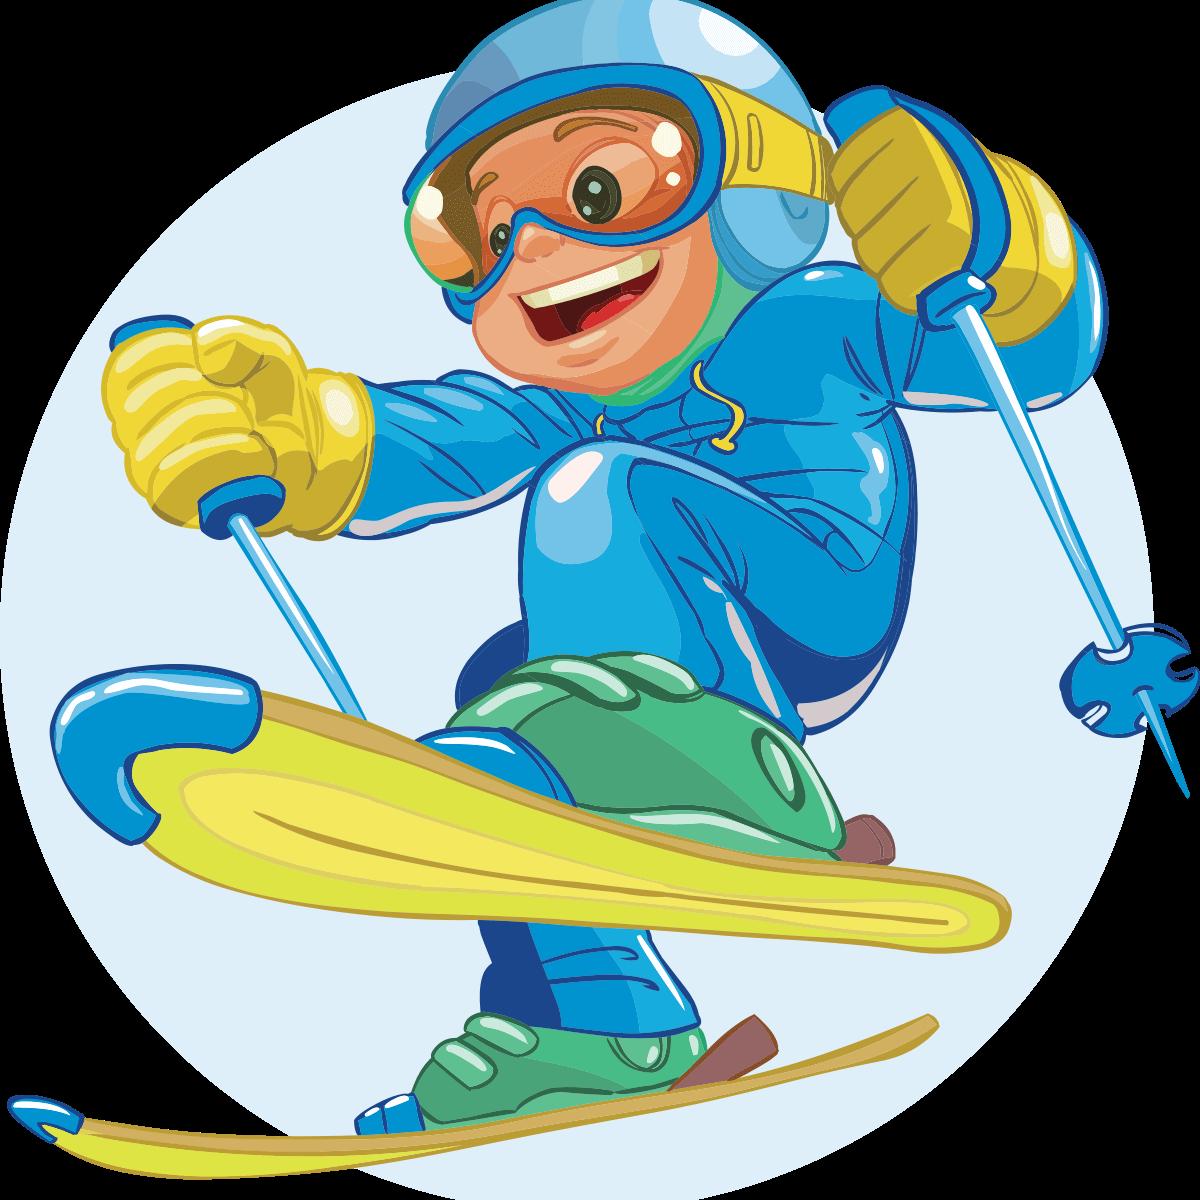 Ski finger lakes mountains. Snowboarding clipart active boy